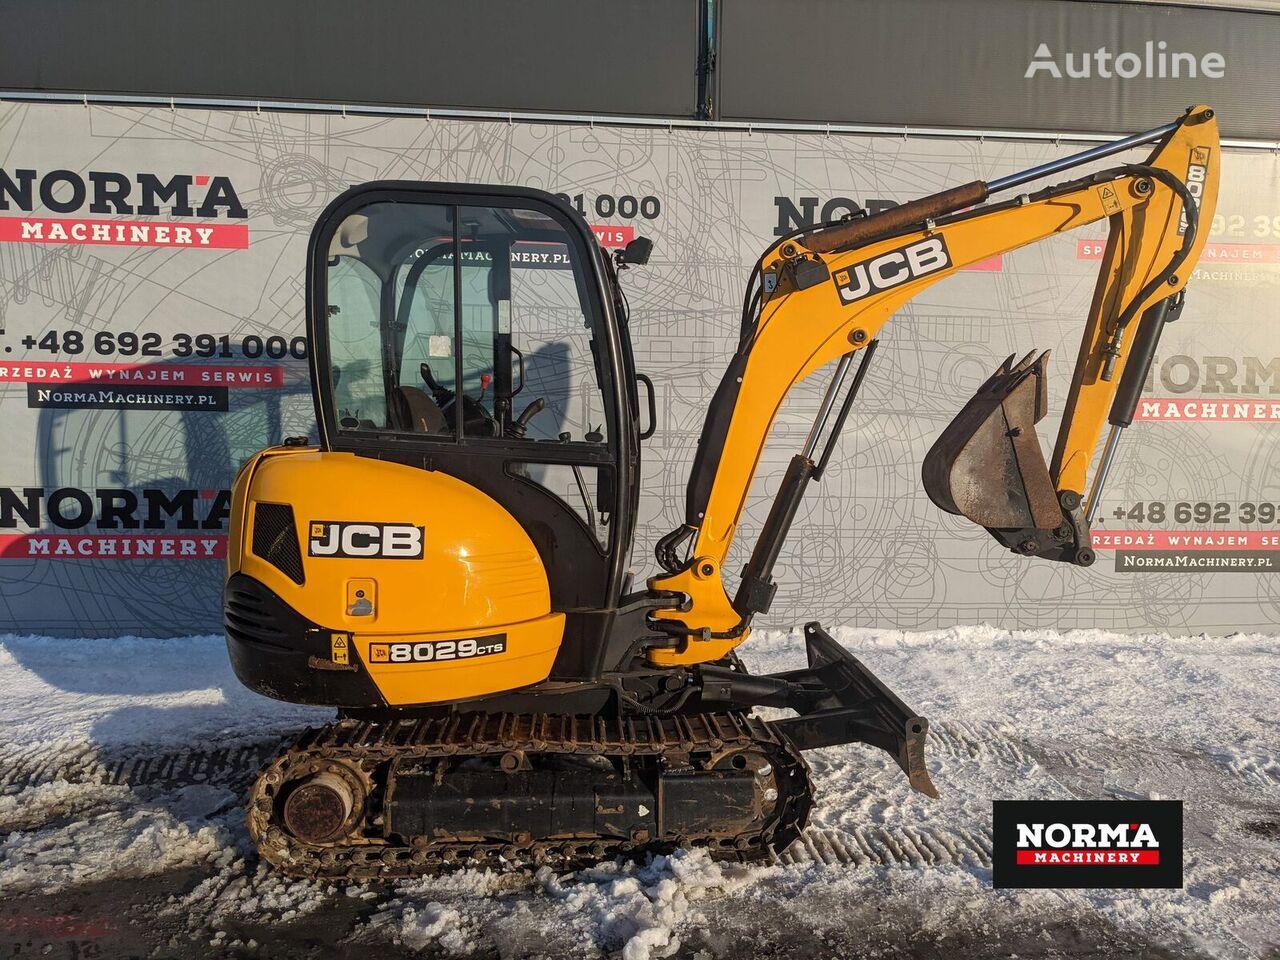 JCB 8029 mini excavator